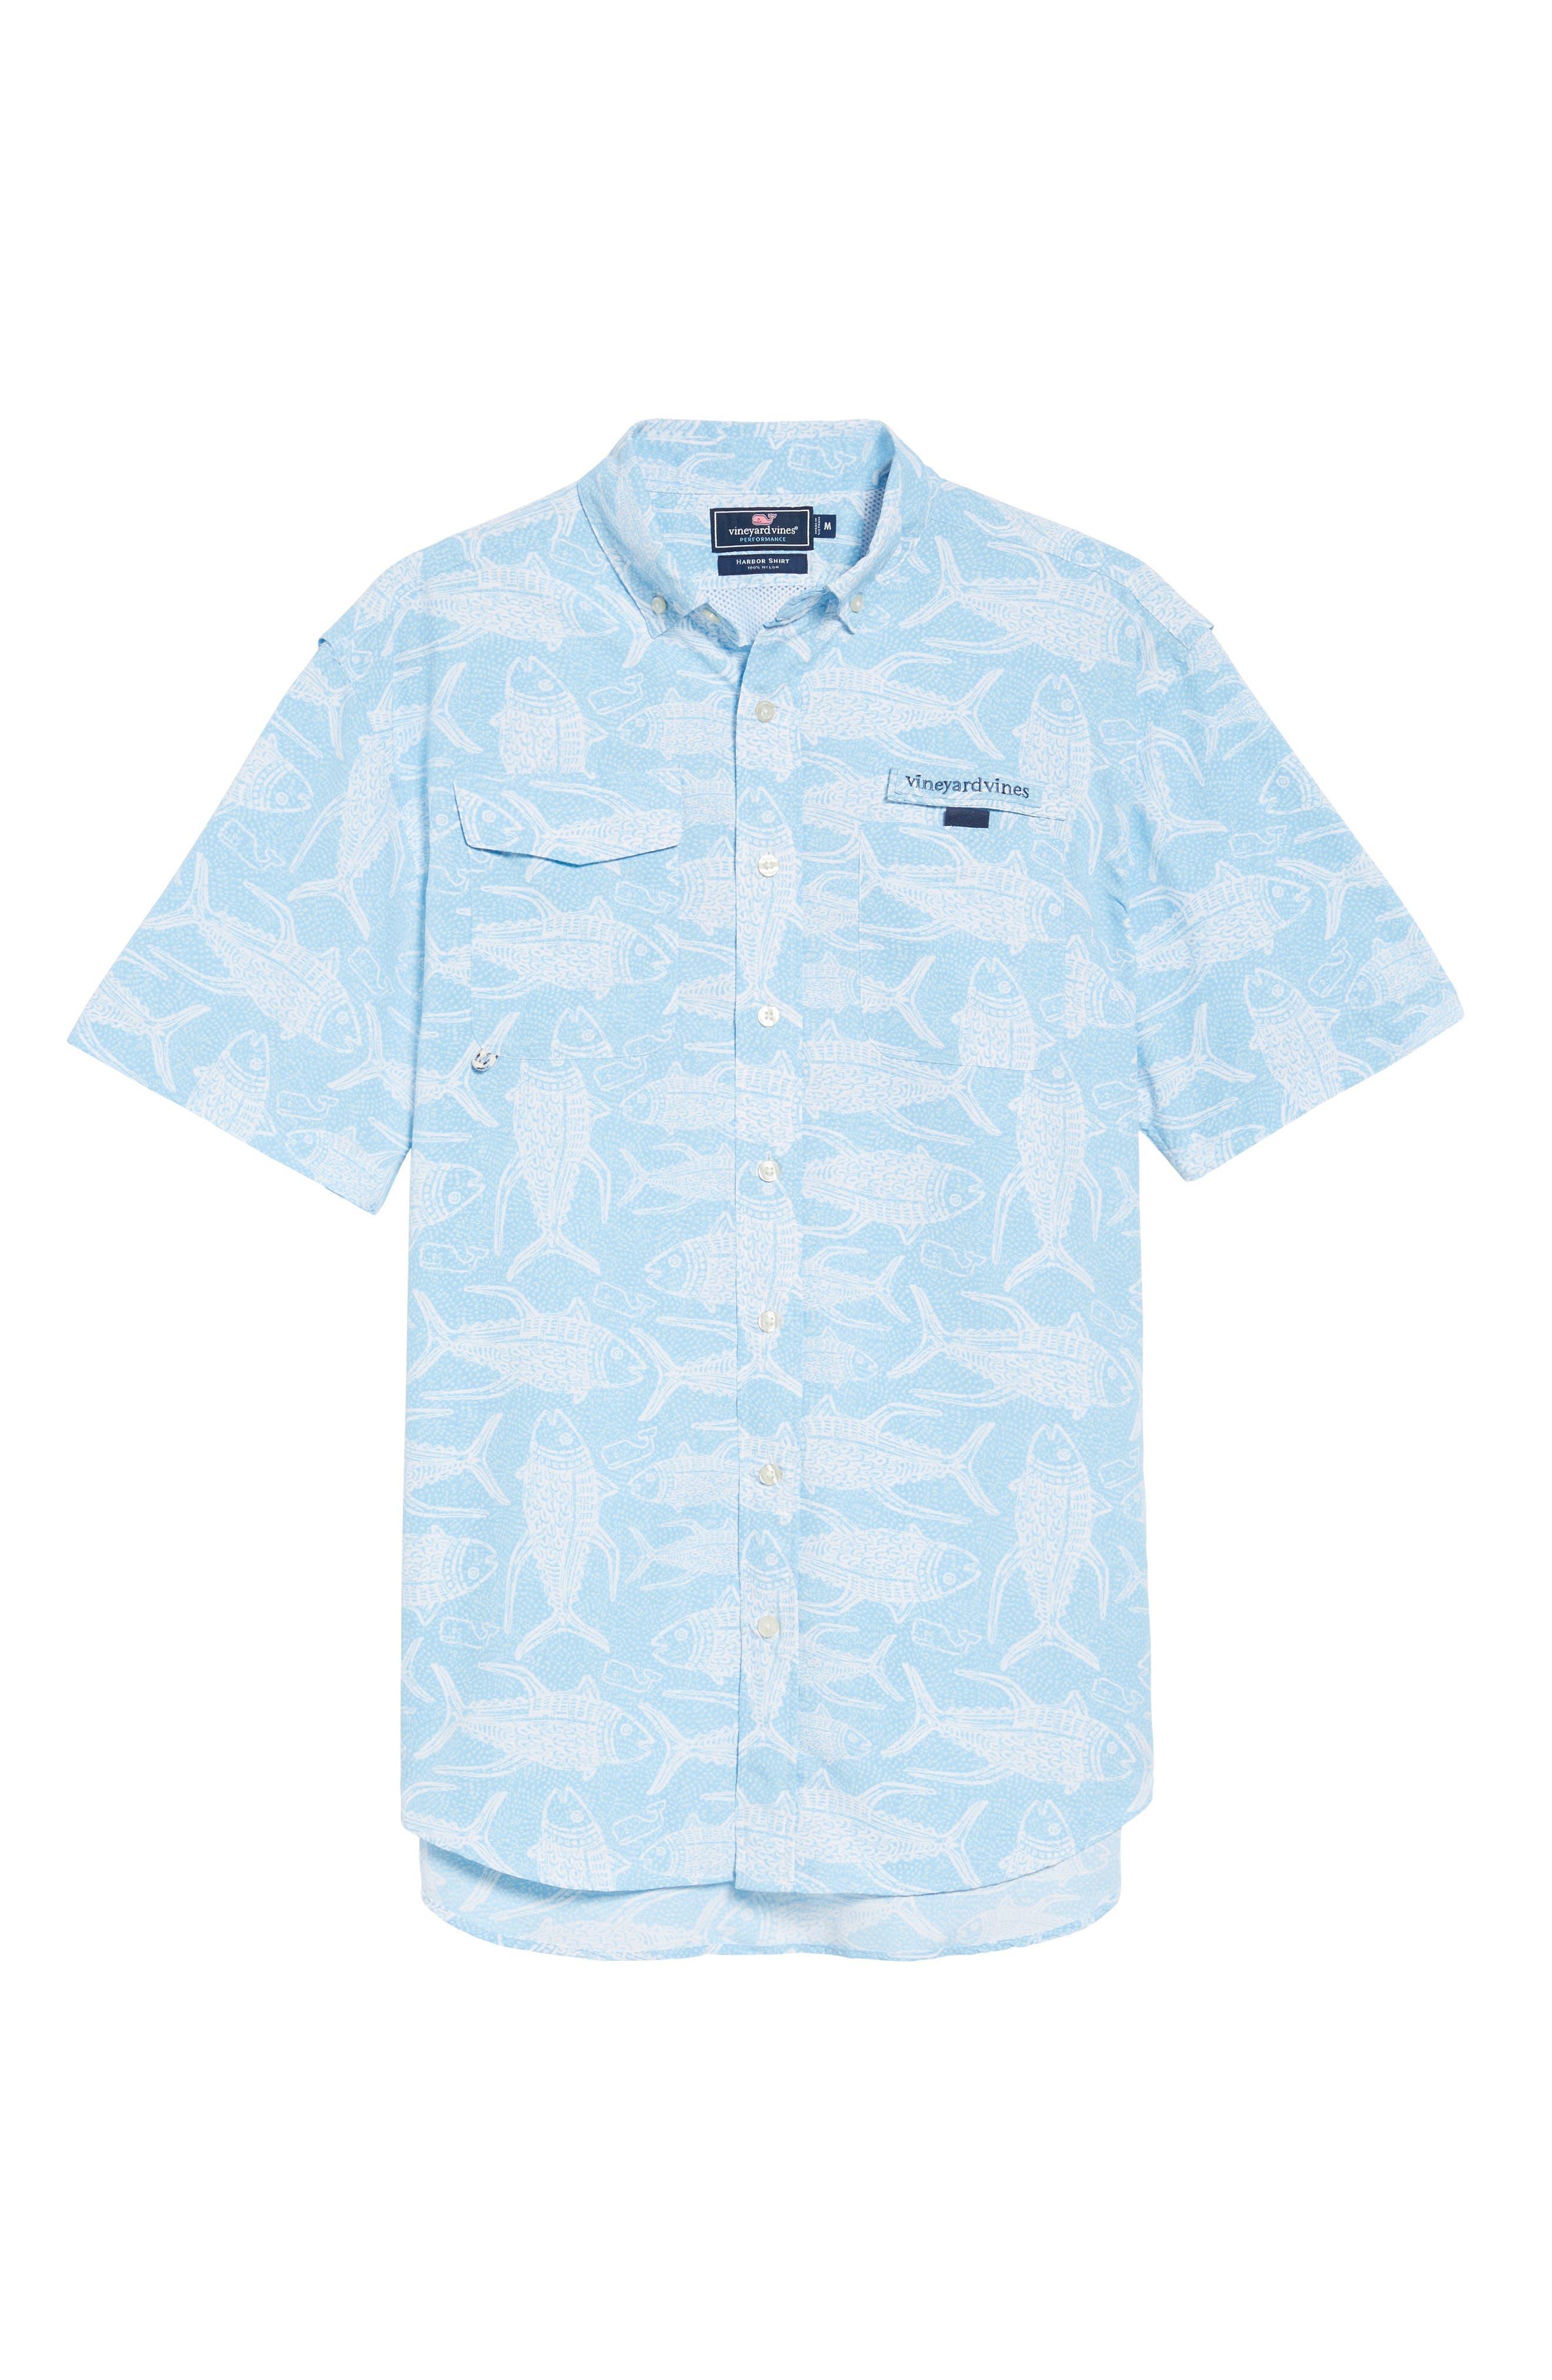 VINEYARD VINES,                             Tuna Batic Harbor Short Sleeve Sport Shirt,                             Alternate thumbnail 6, color,                             456